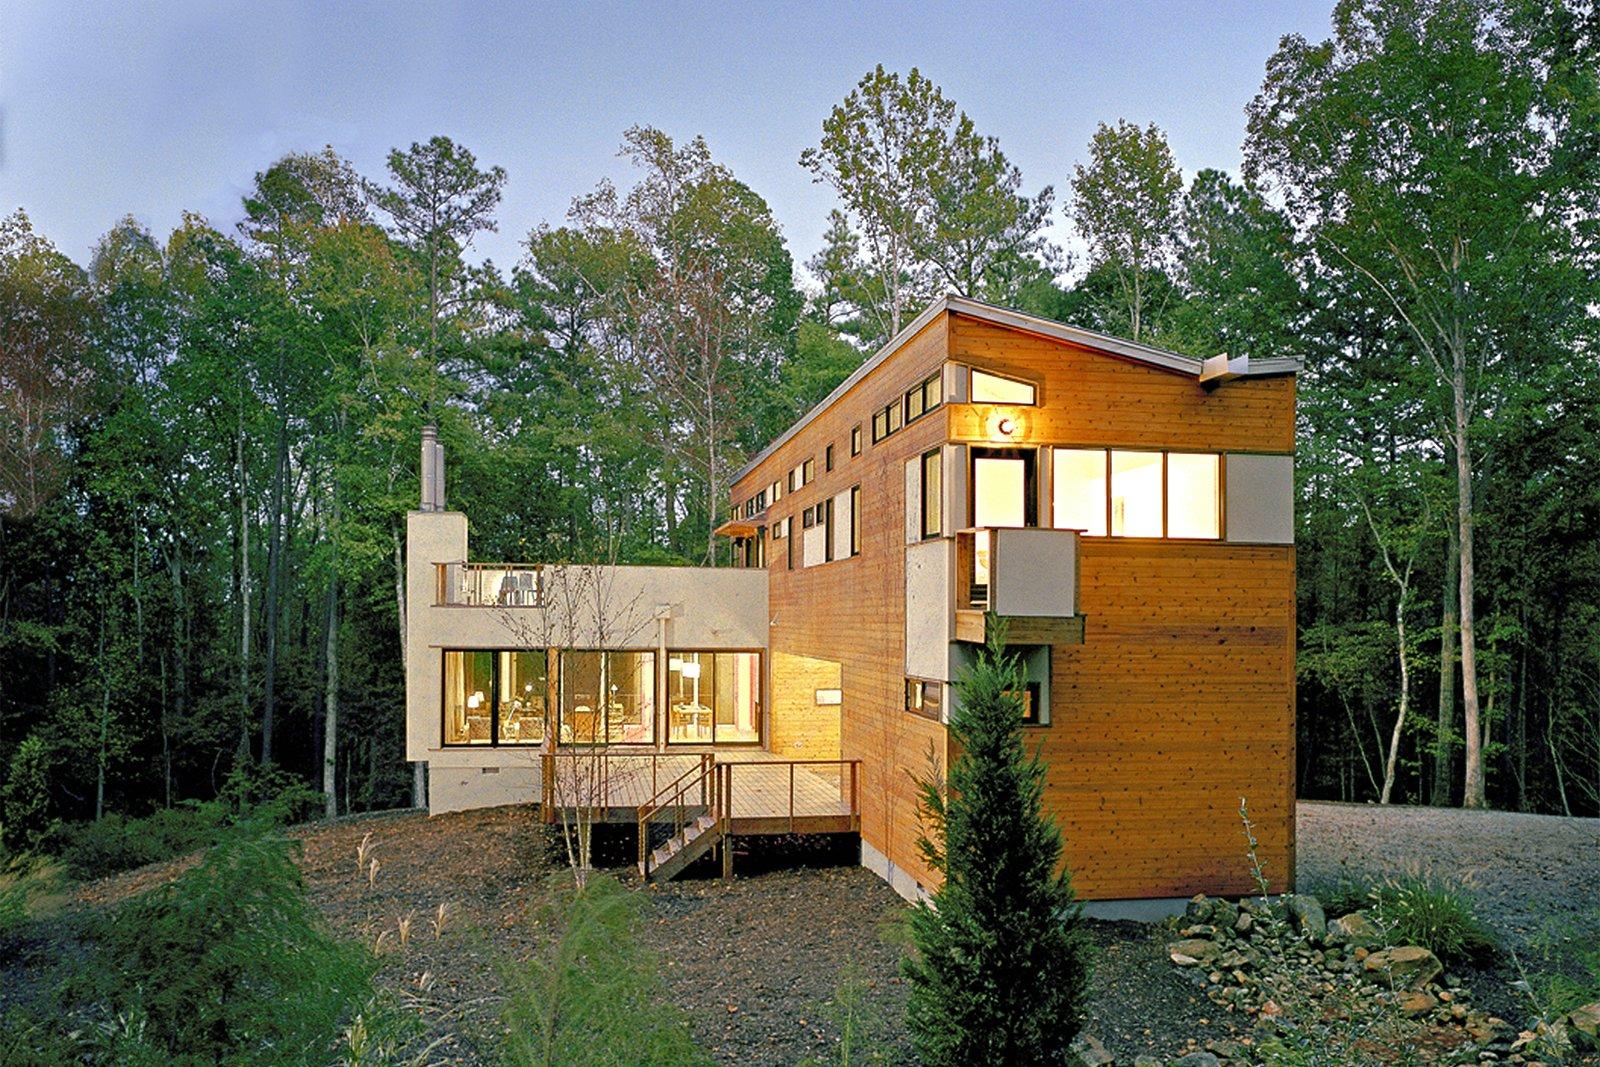 Prefab Homes in North Carolina